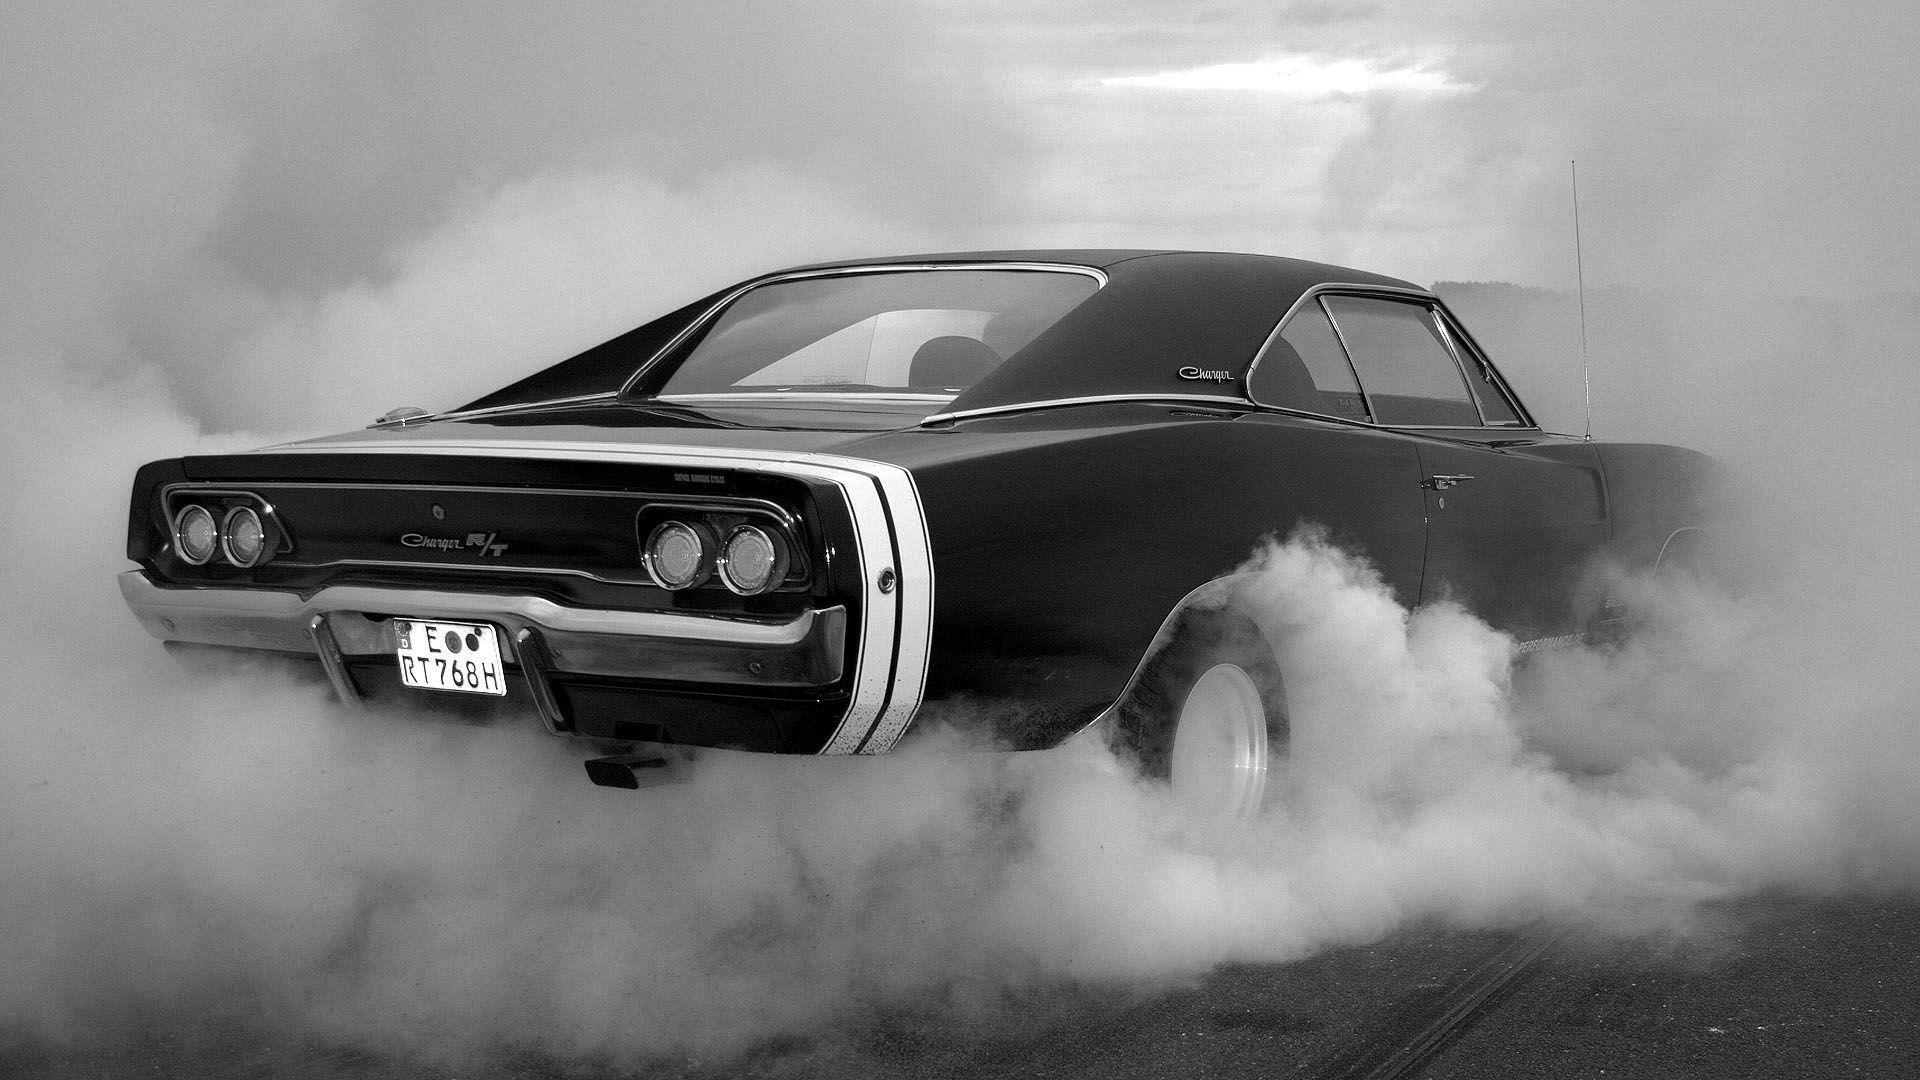 Muscle Car Burnout Wallpapers Top Free Muscle Car Burnout